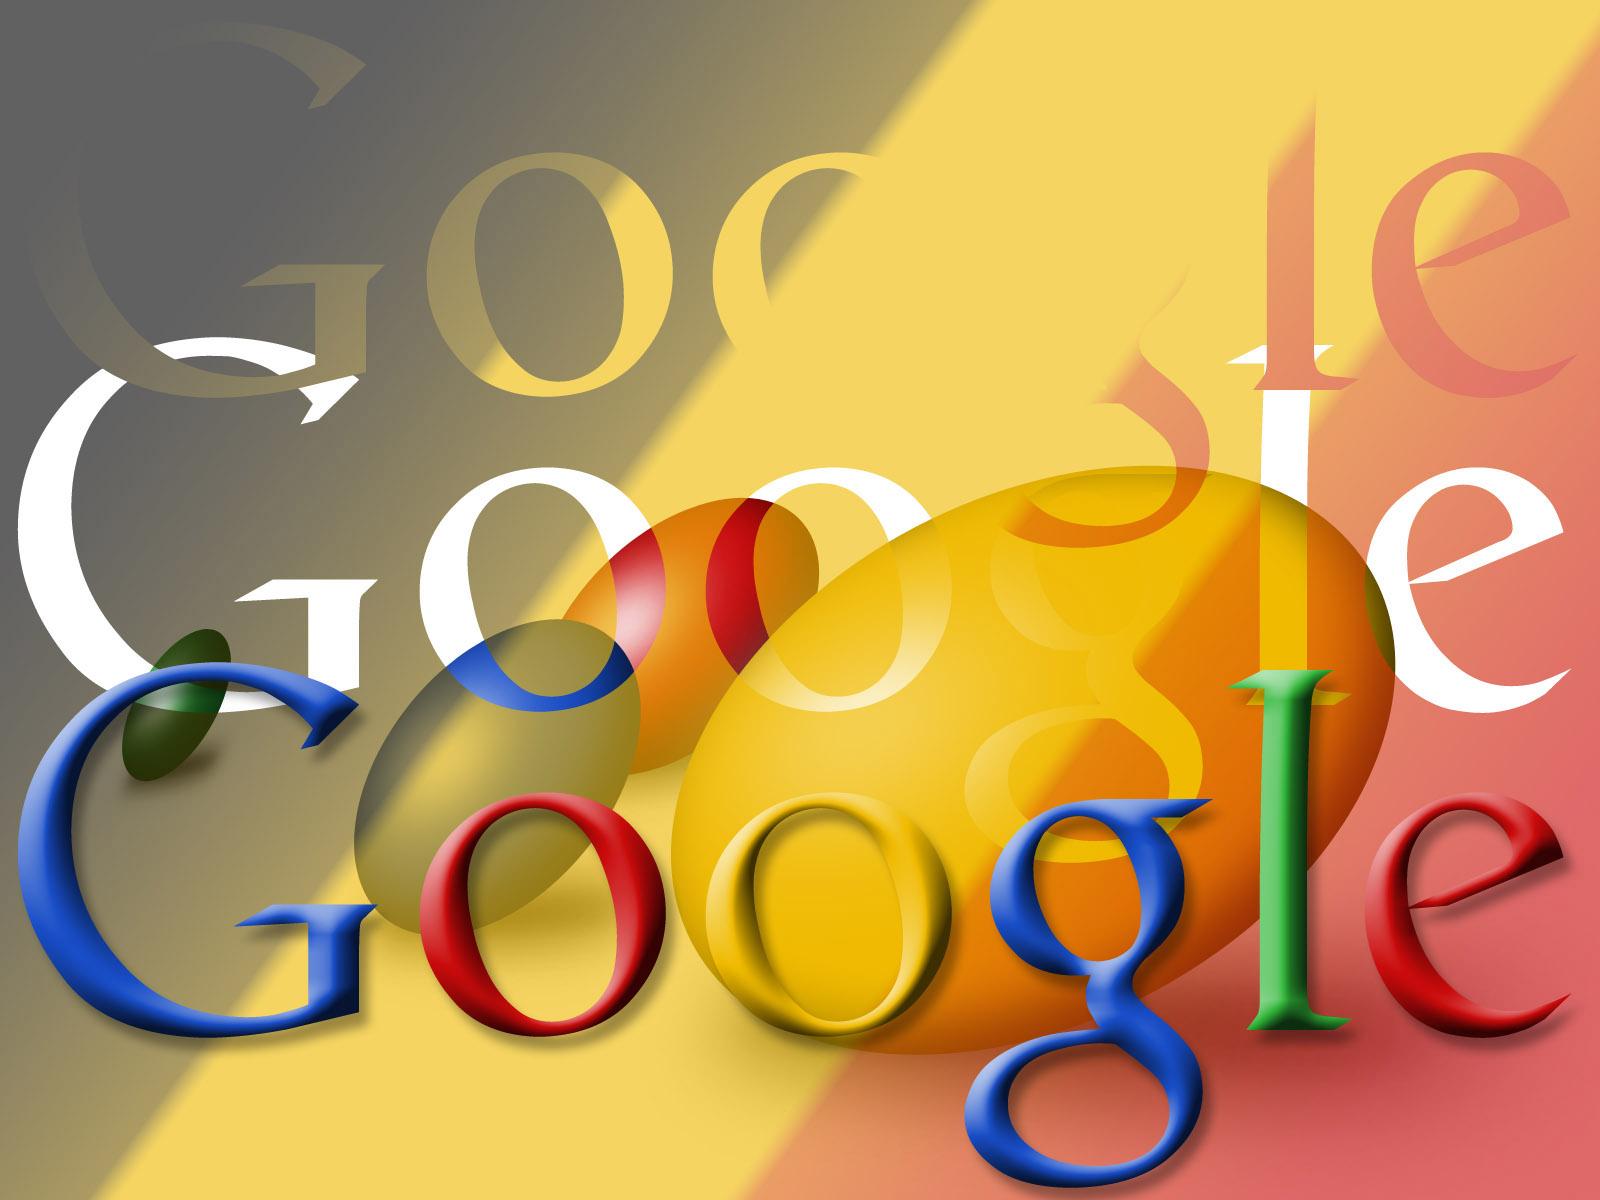 Google Hd Clipart For Desktop.